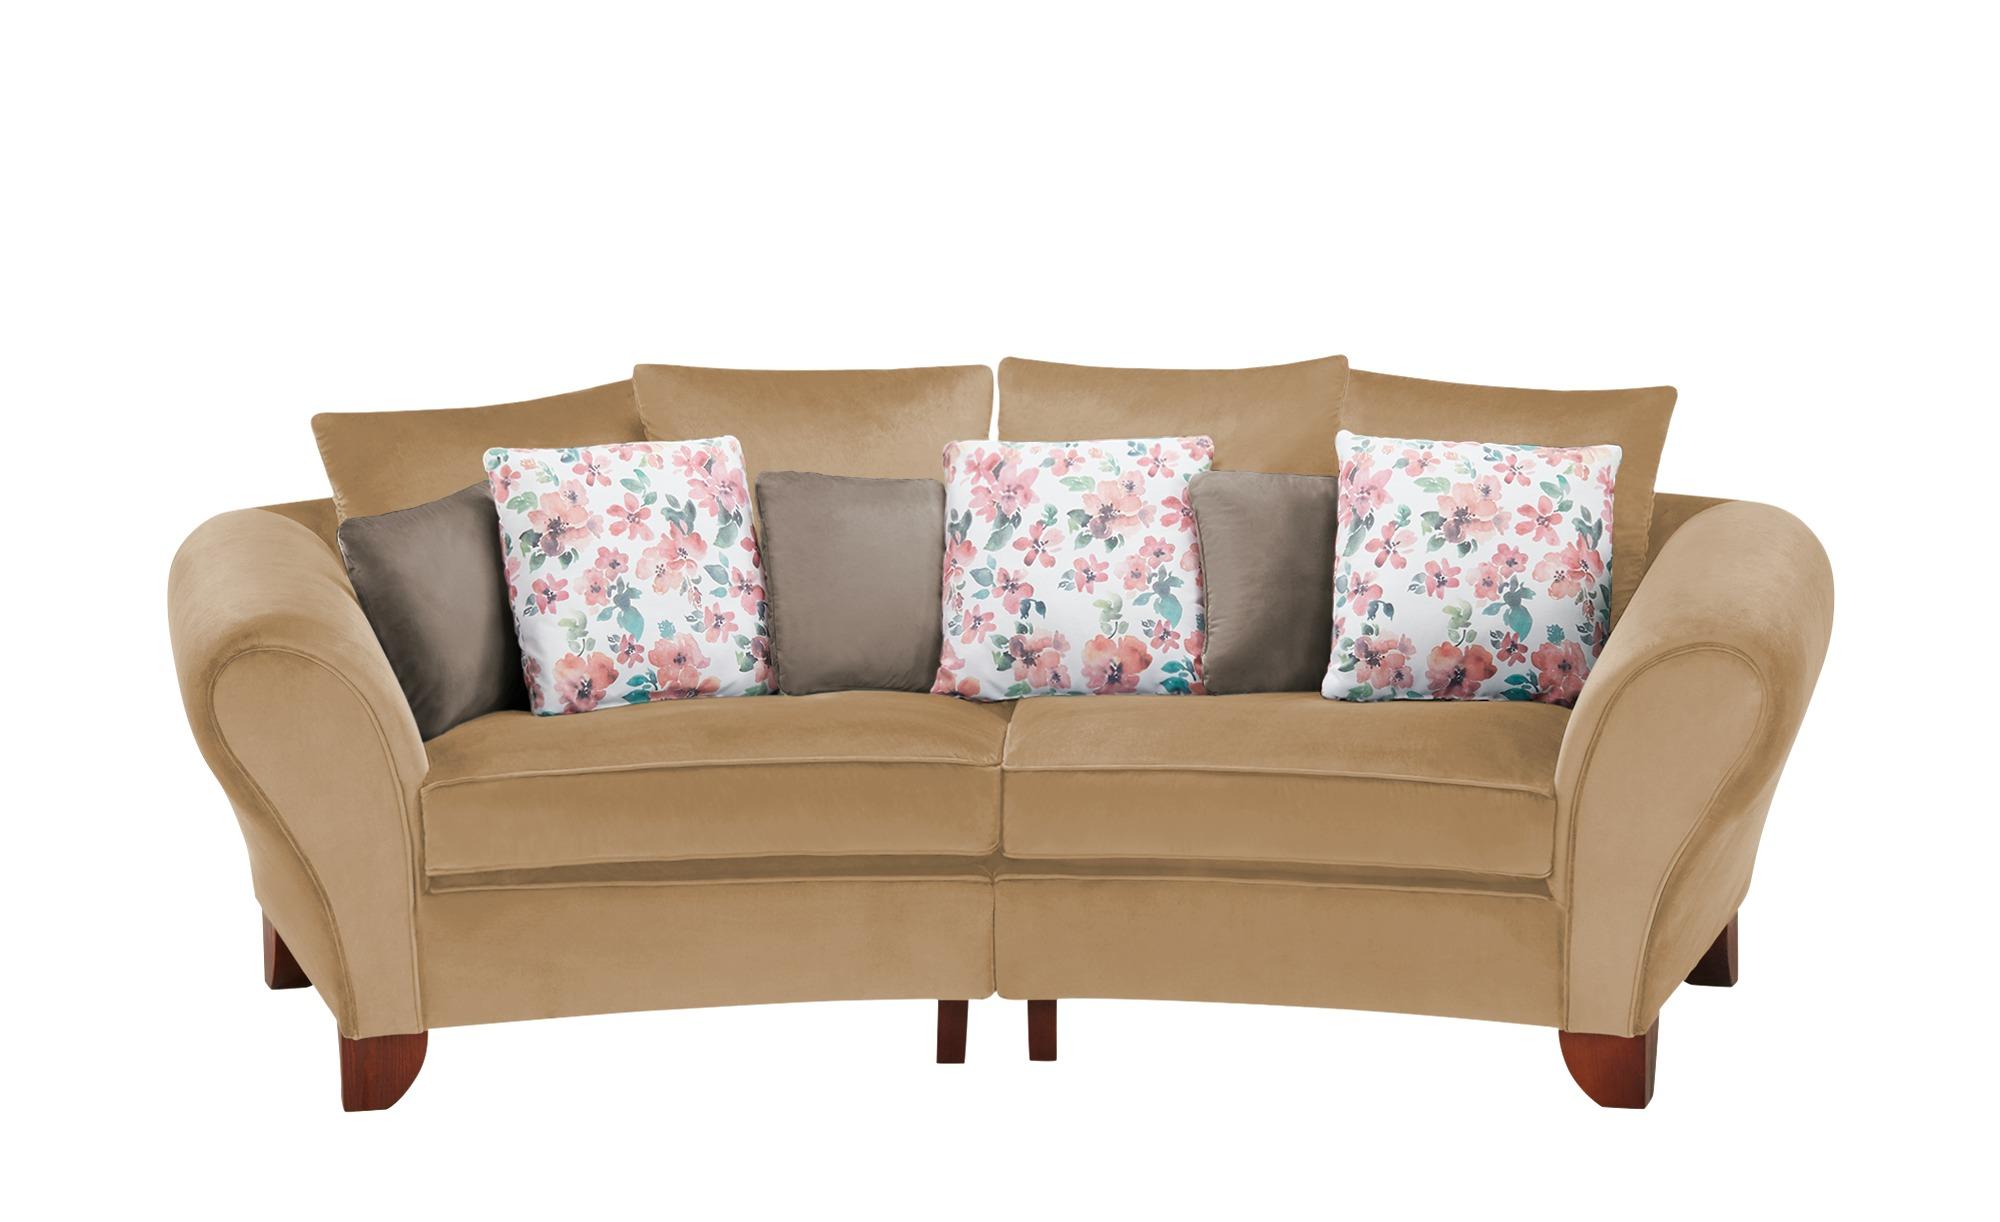 smart Big Sofa  Nadja ¦ beige ¦ Maße (cm): B: 277 H: 95 T: 108 Polstermöbel > Sofas > 3-Sitzer - Höffner